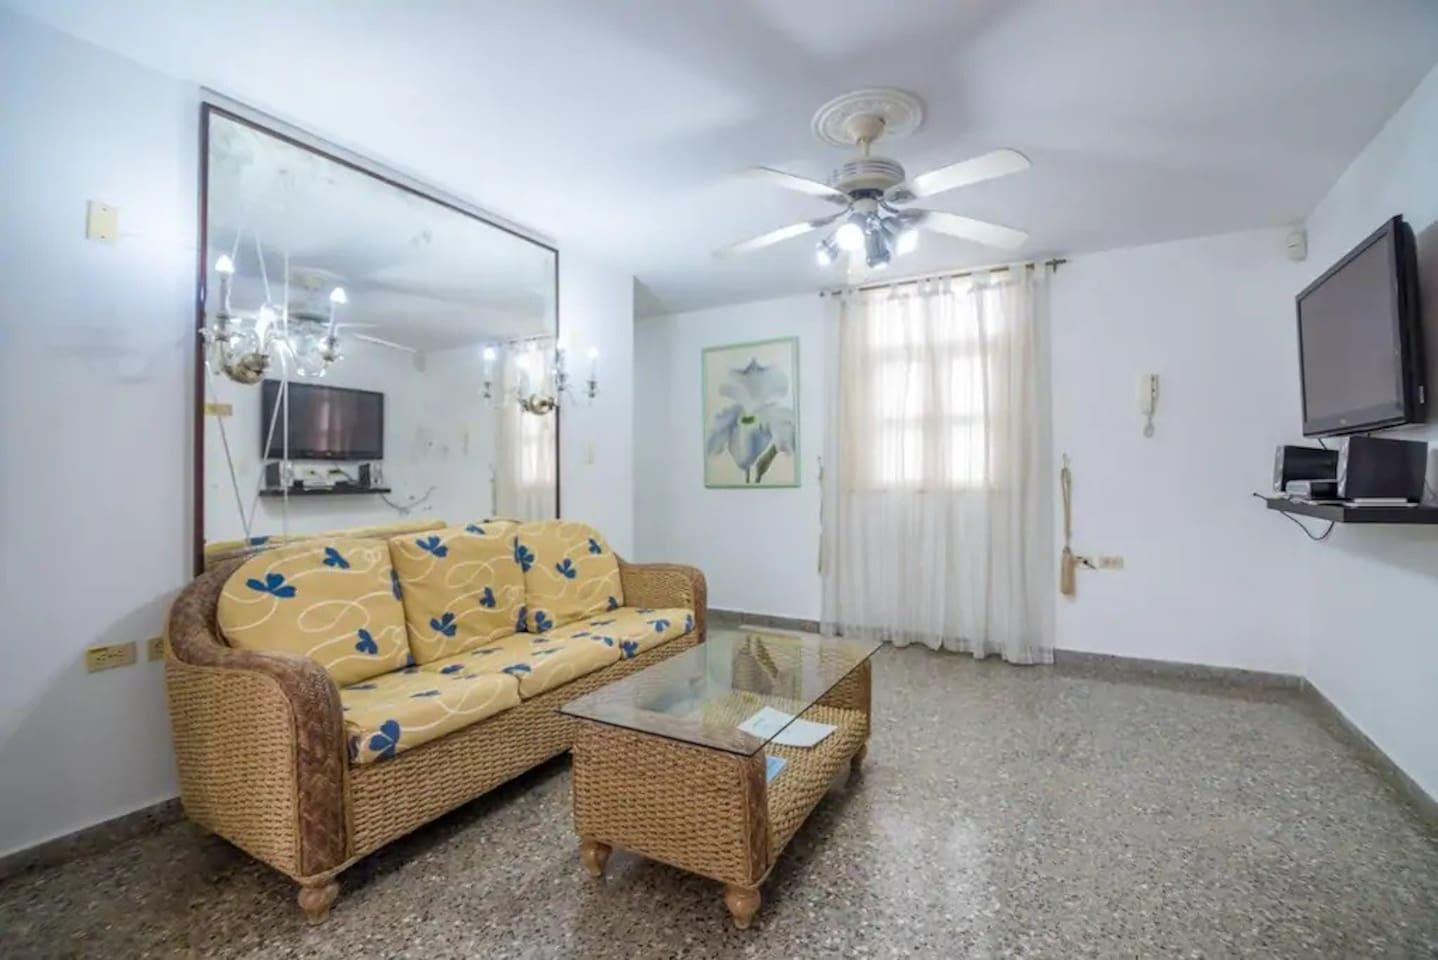 Apartment Villa Don Teto Suite   8 Rooms  Great Havana View photo 16816155